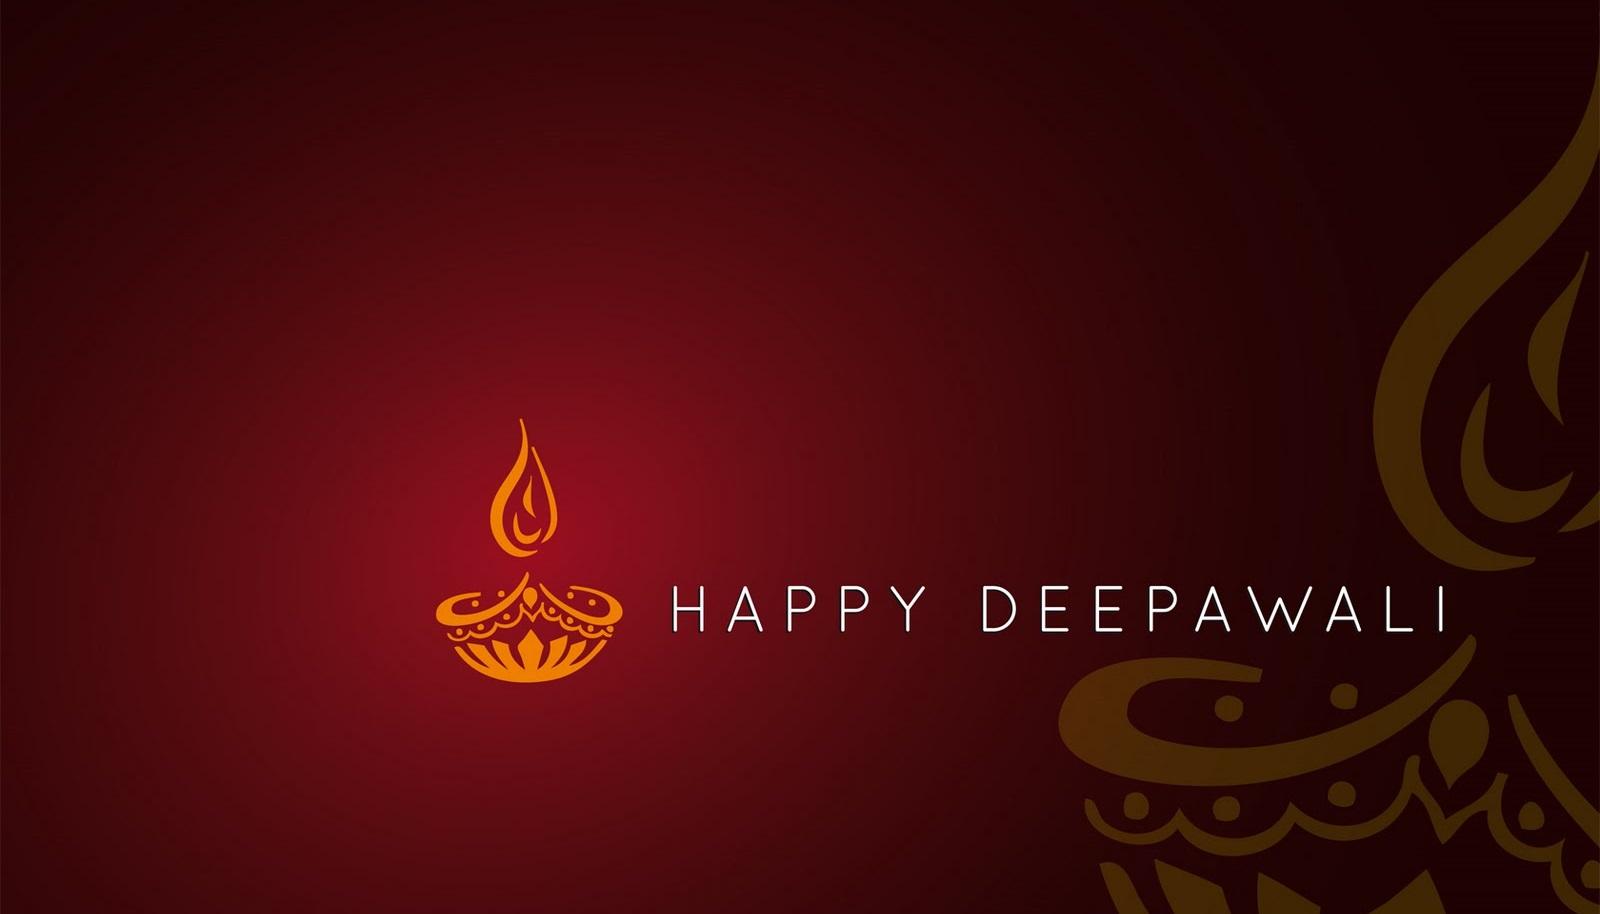 unique diwali gift ideas for this festive season